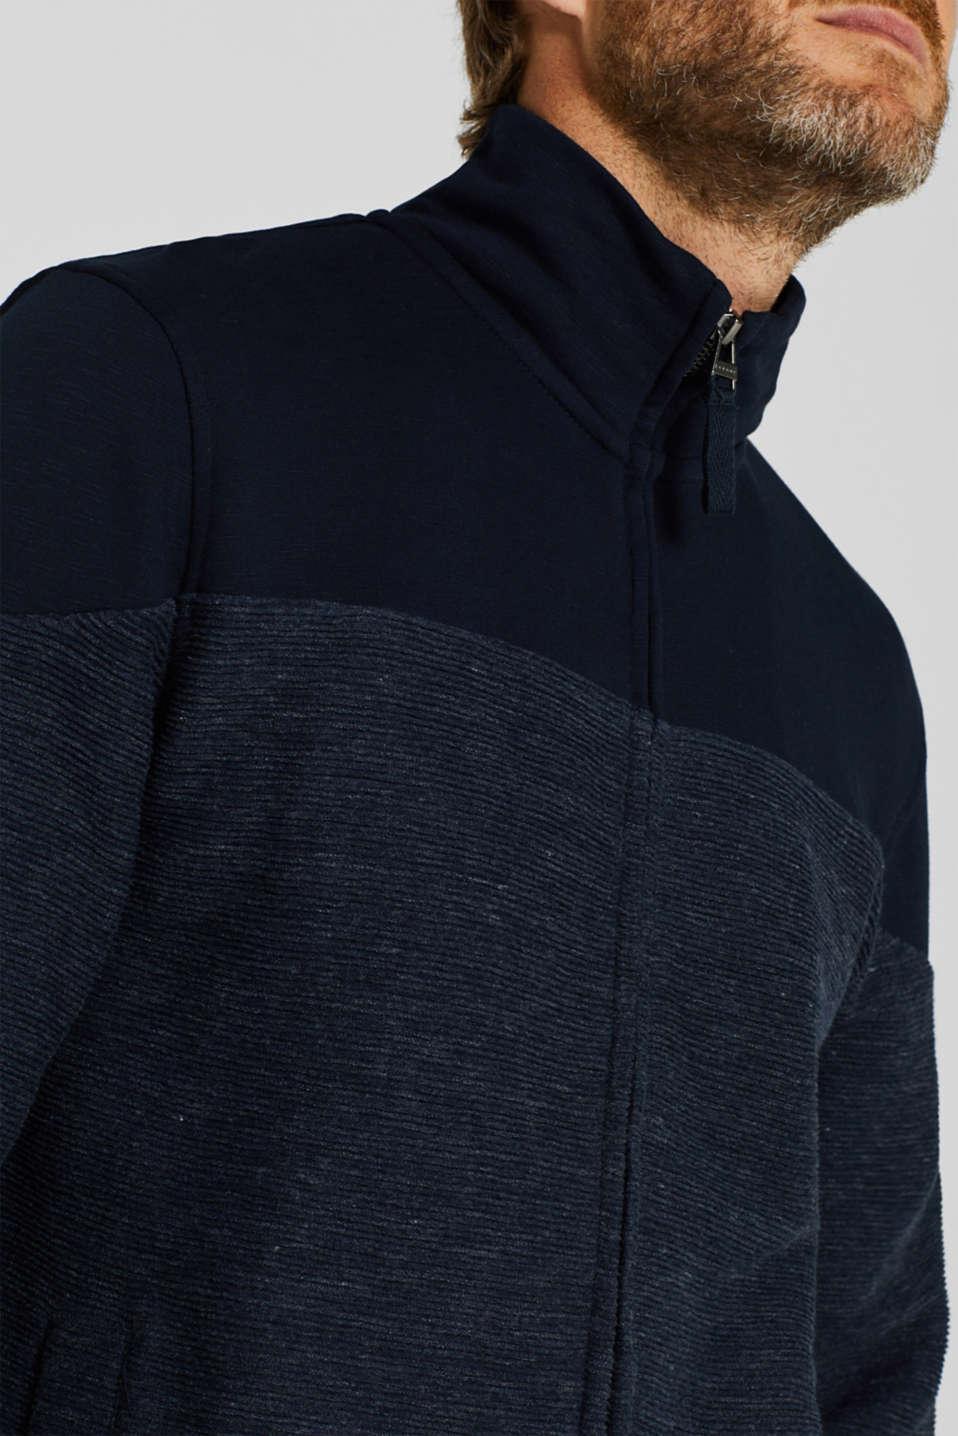 Sweatshirt cardigan with organic cotton, NAVY, detail image number 2